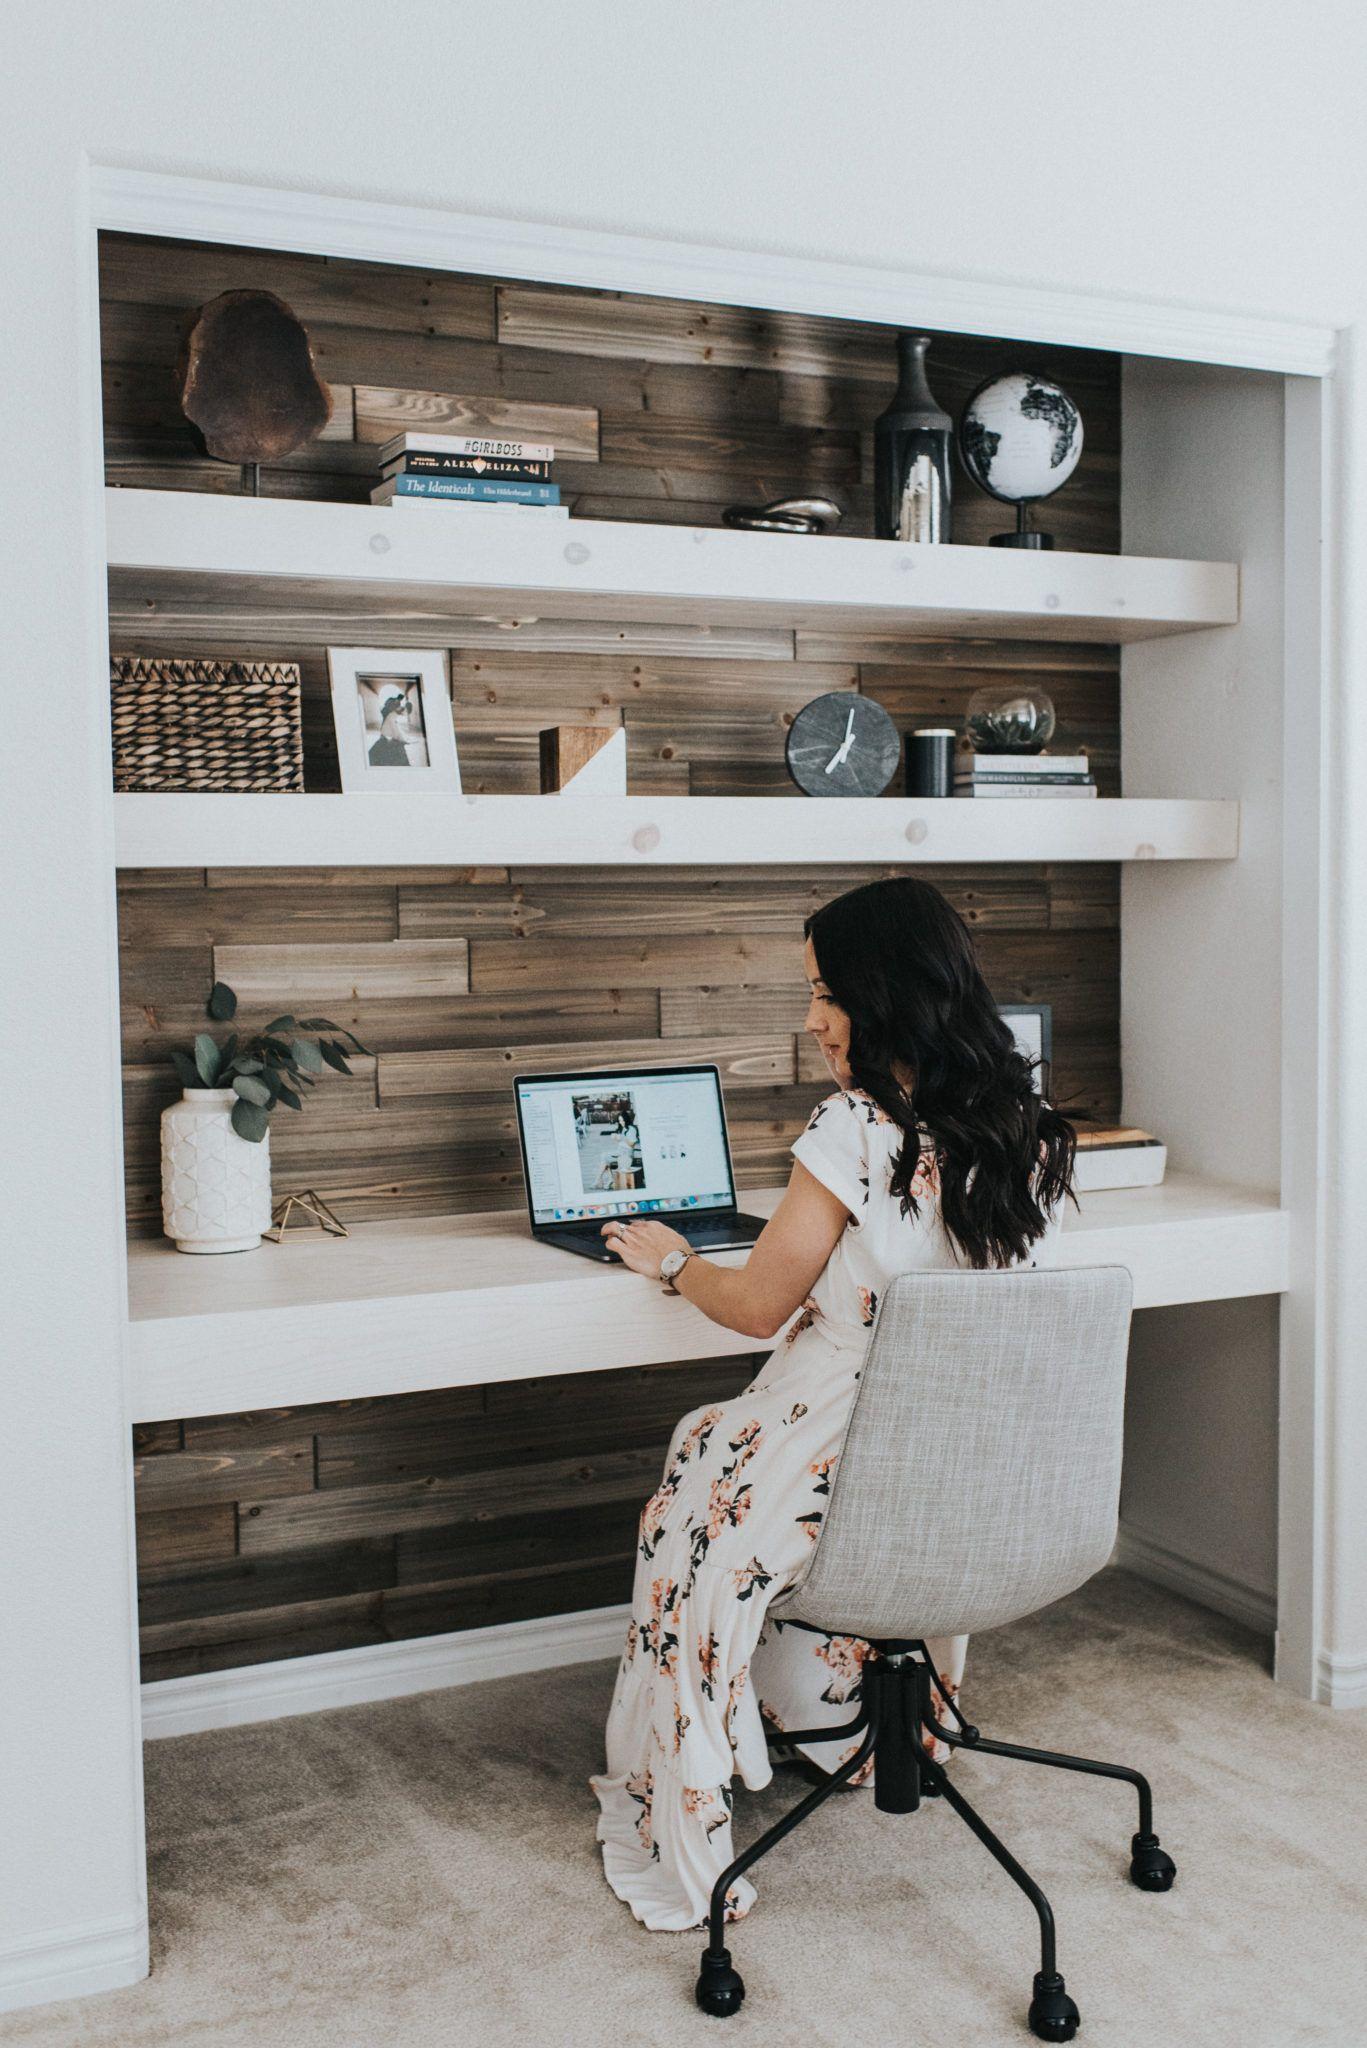 Contemporary Office Ideas Diy Closet Office Outfits Outings Home Office Closet Home Office Decor Contemporary Office